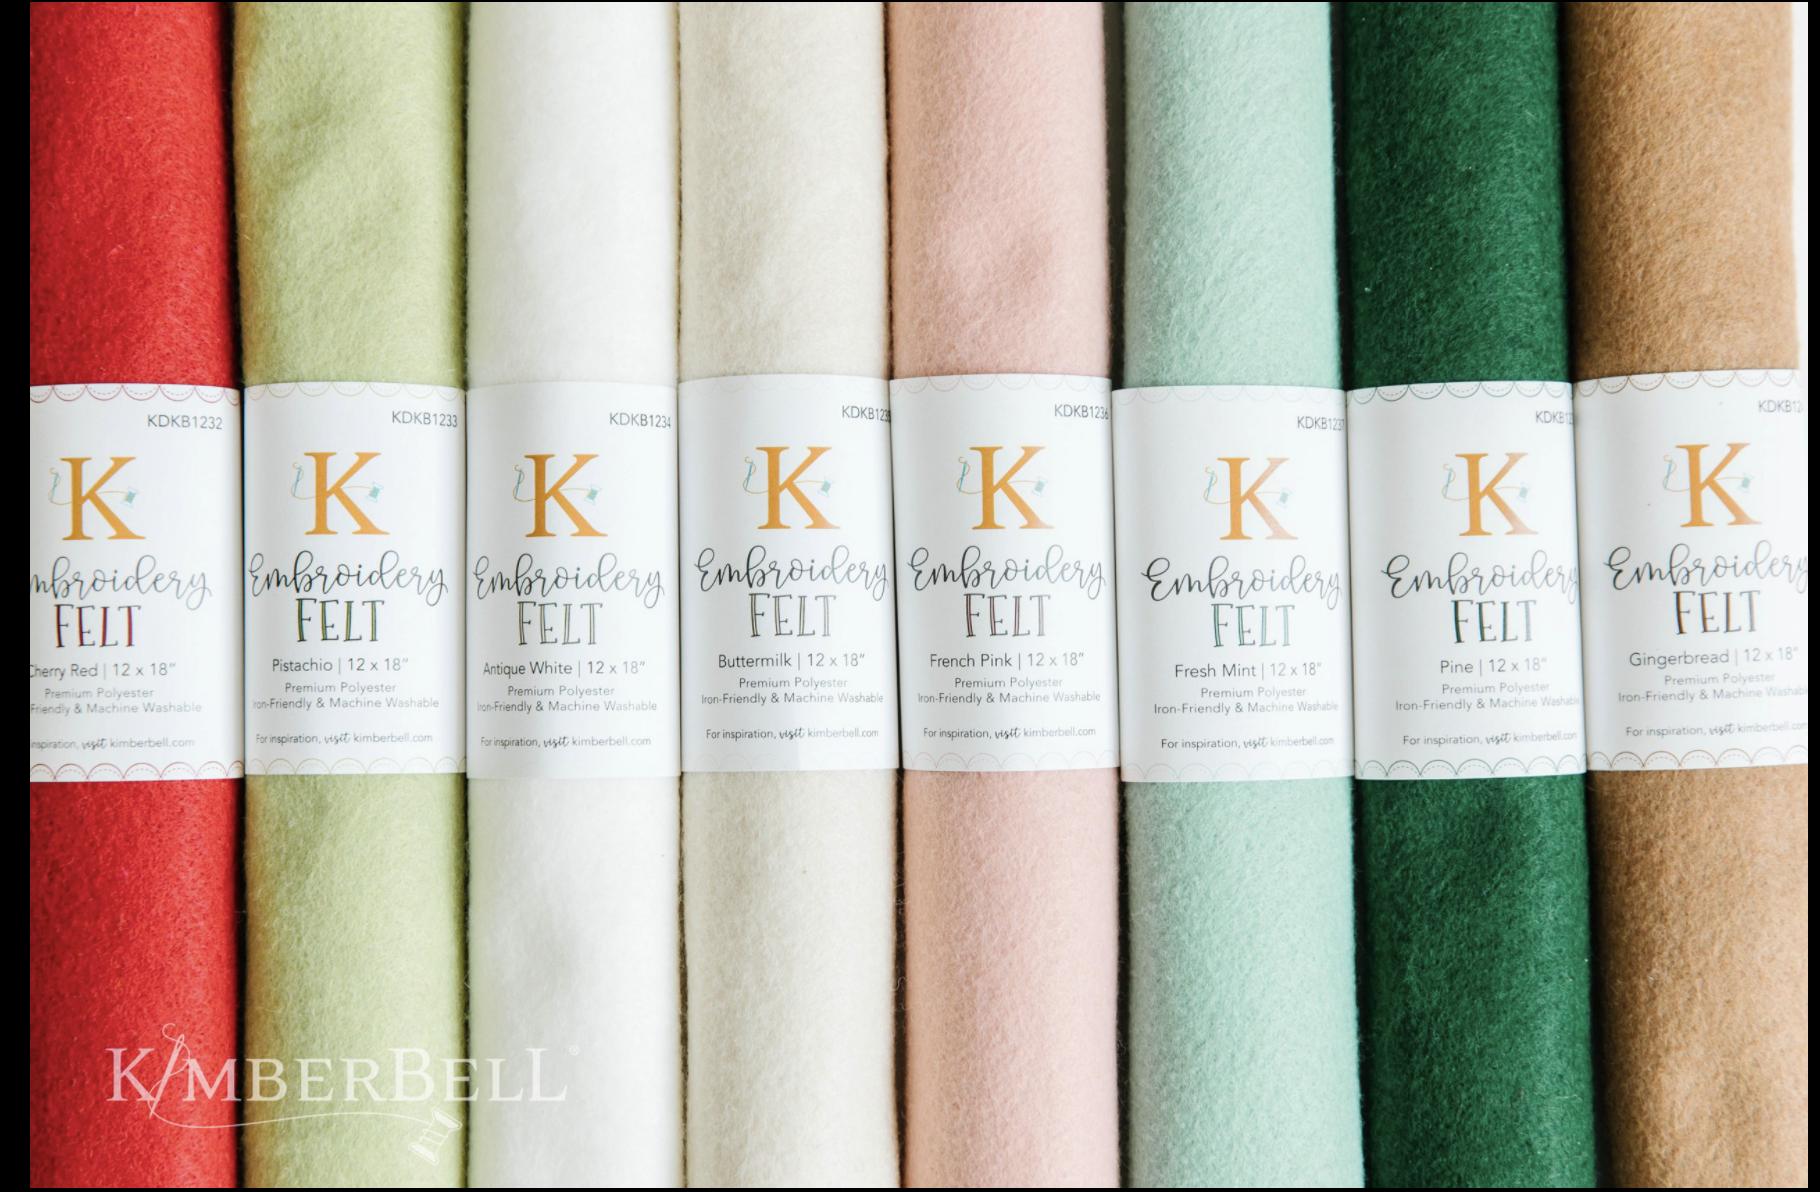 Embroidery Felt Kimberbell